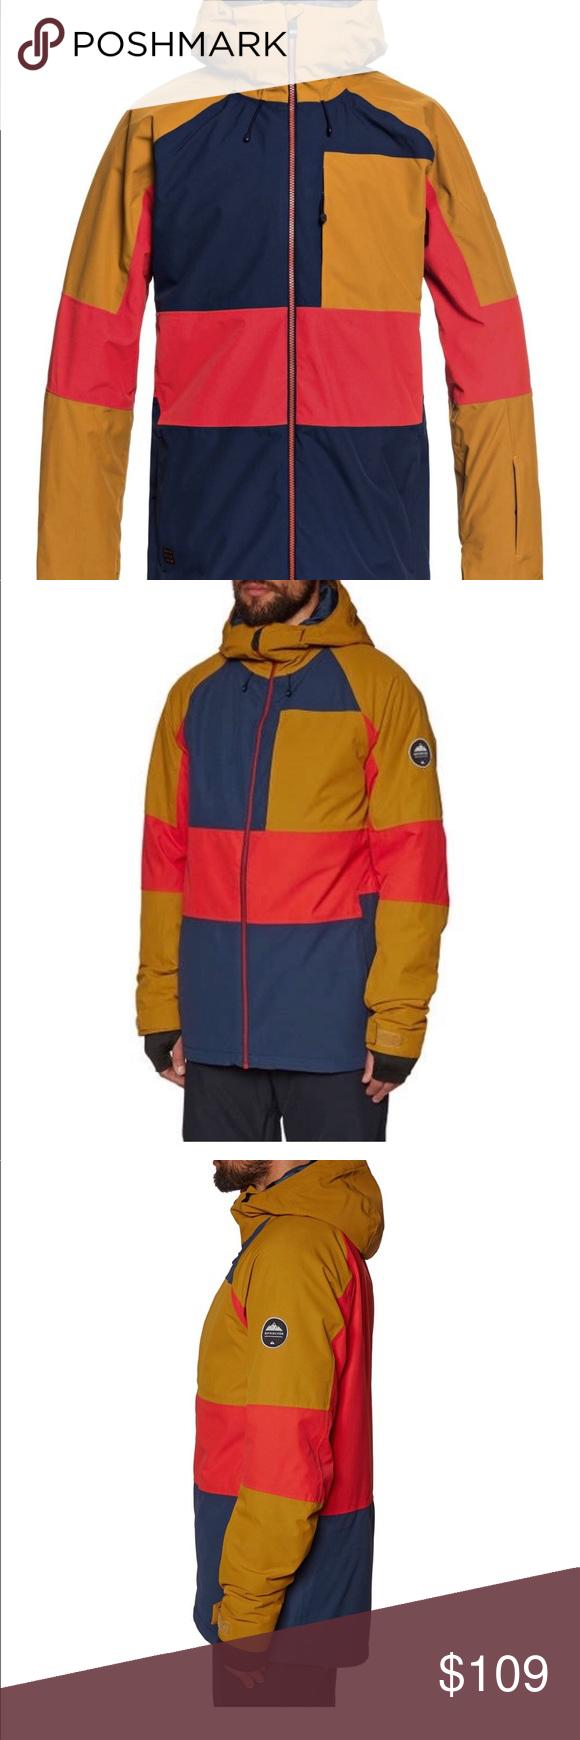 614b7b8fe O'Neil Sycamore Snow Jacket (L) New Snowboard jacket, Size L. O ...